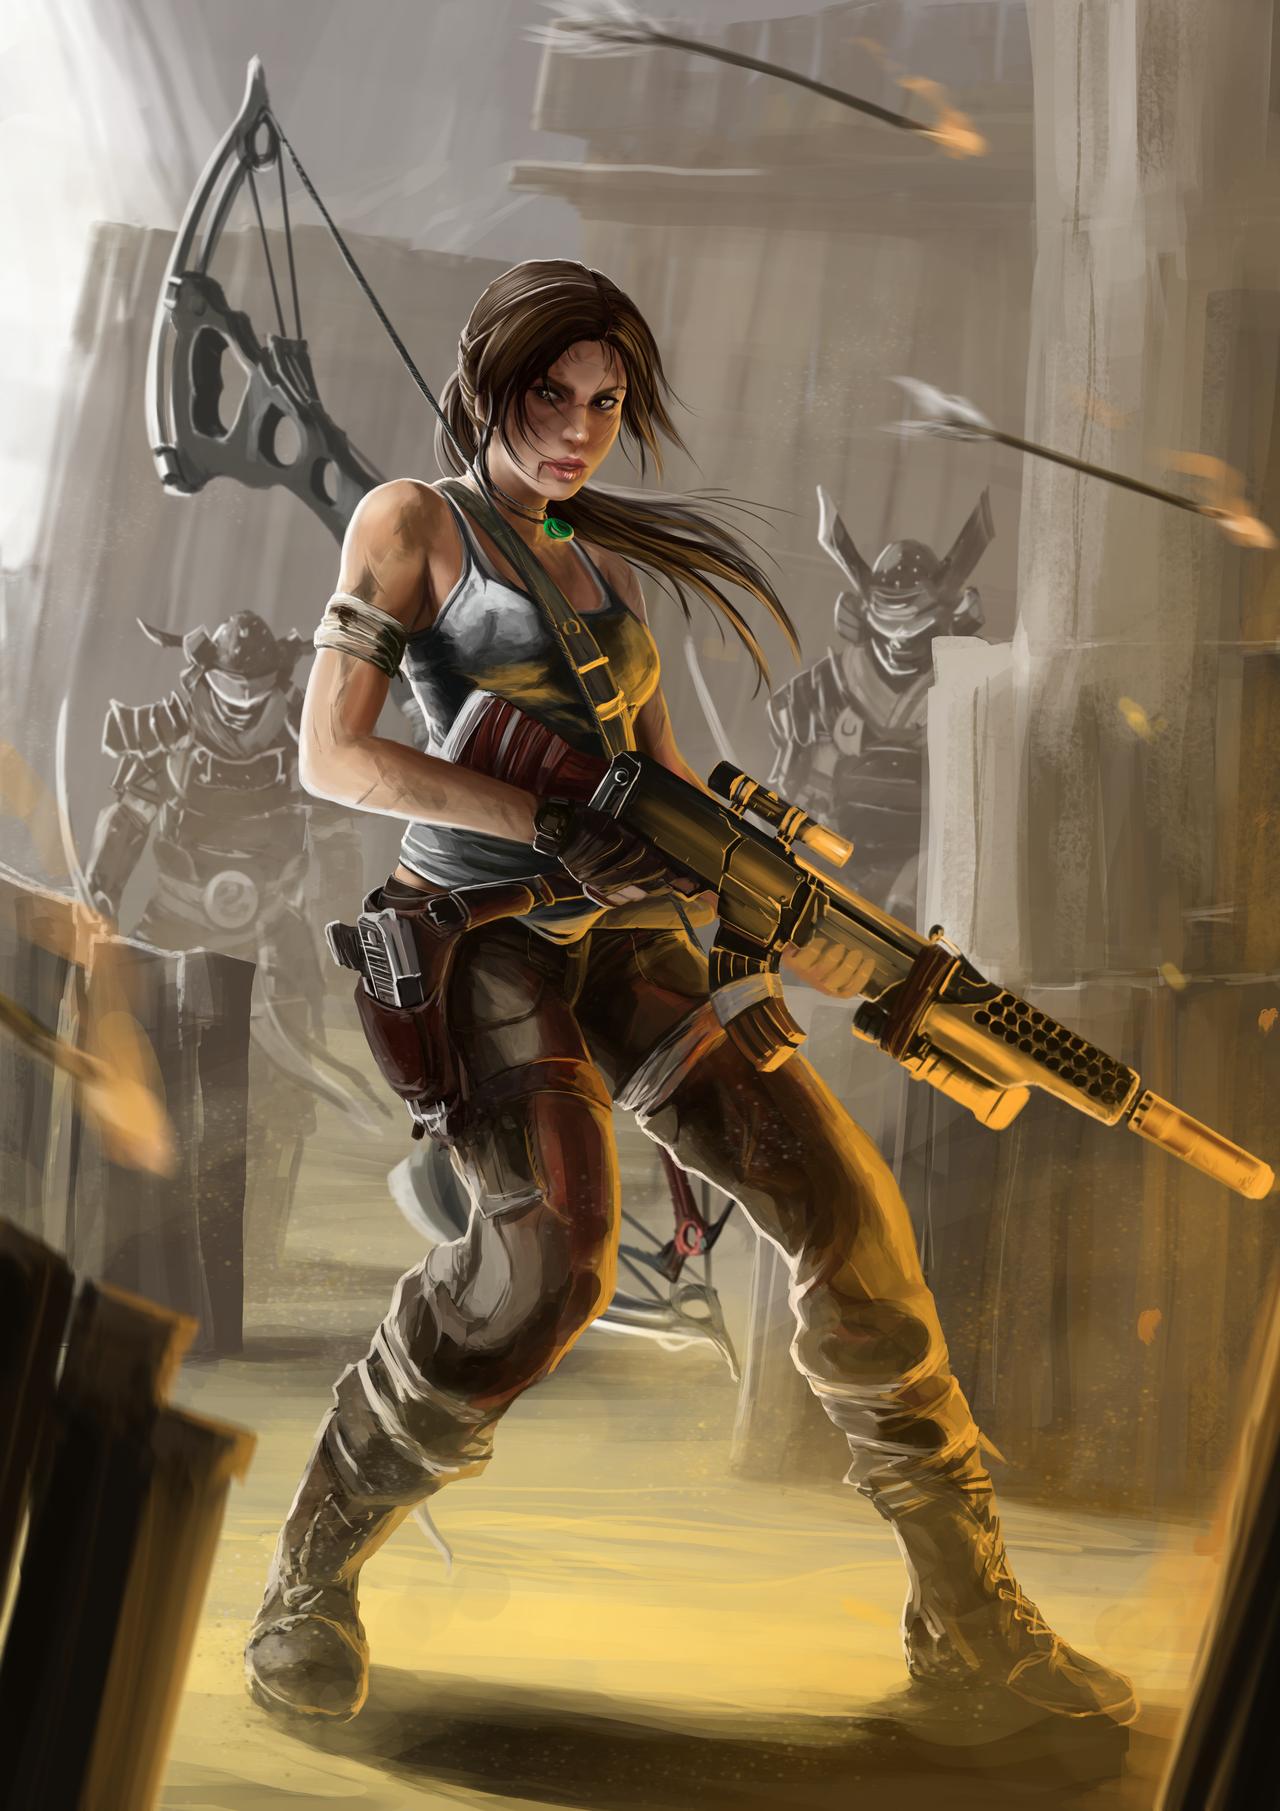 Lara Croft by PeterPrime